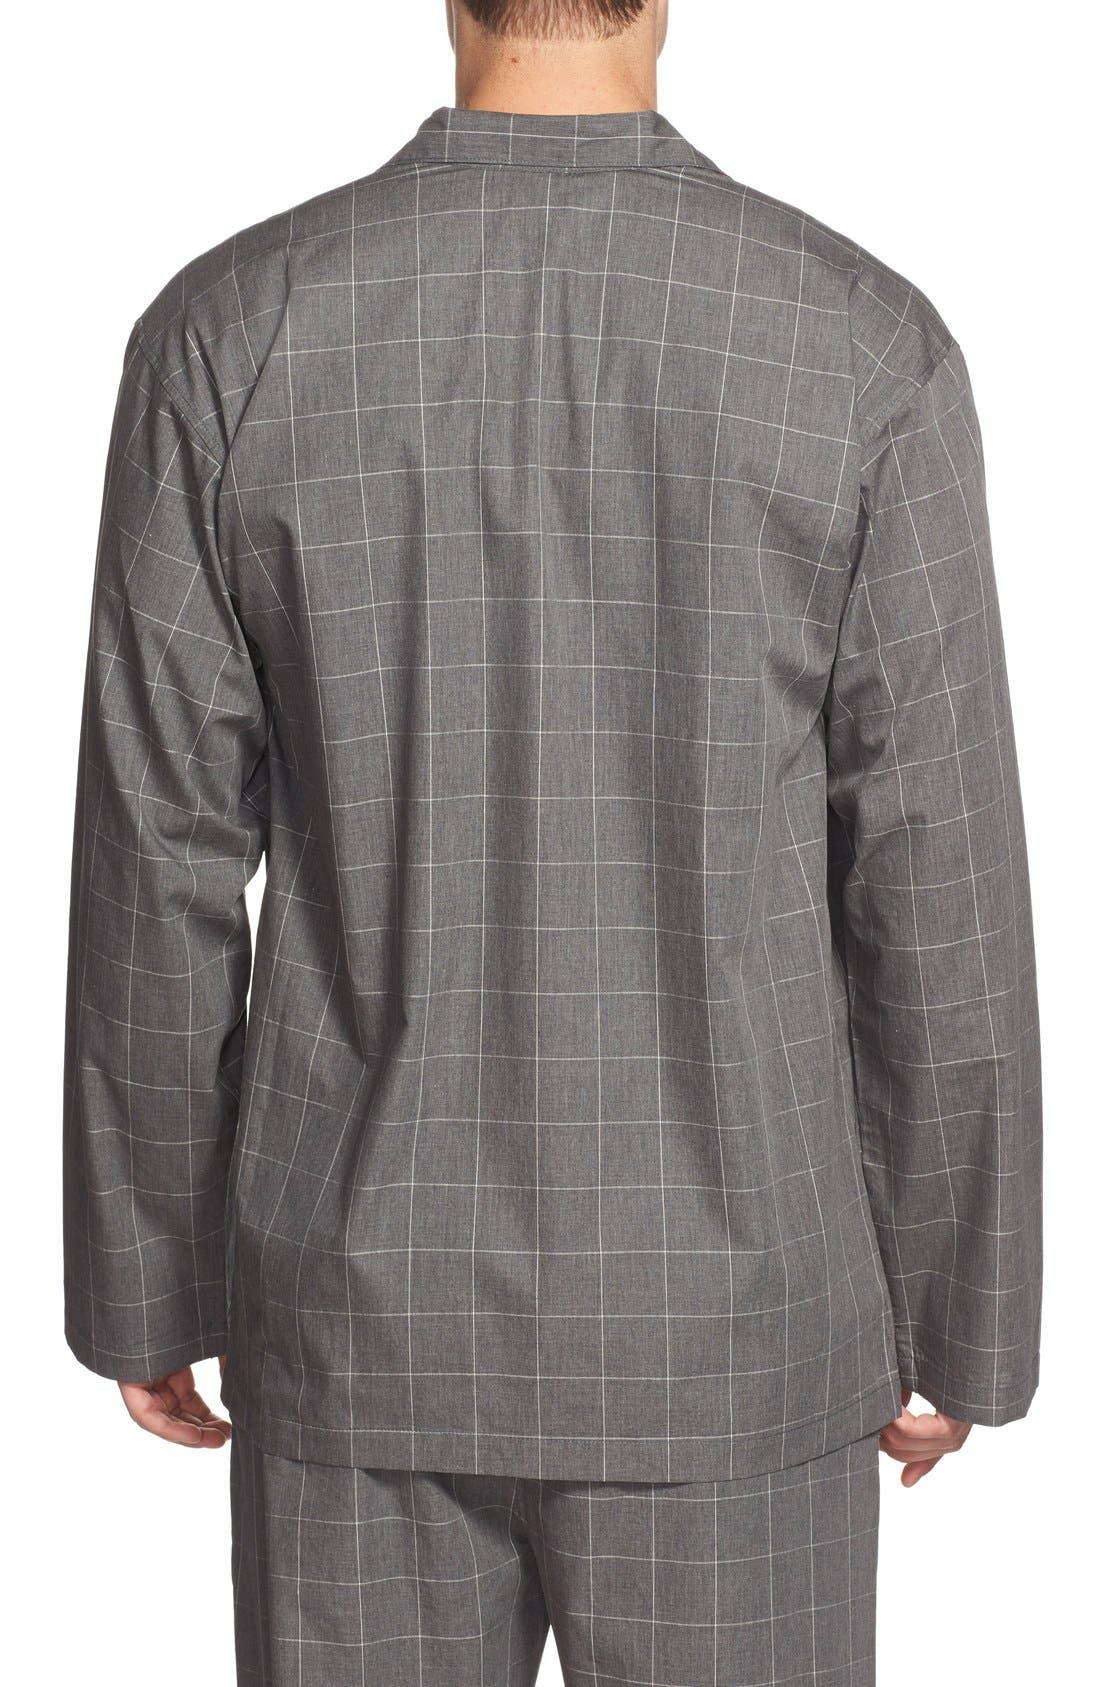 Woven Pajama Top,                             Alternate thumbnail 2, color,                             Charcoal